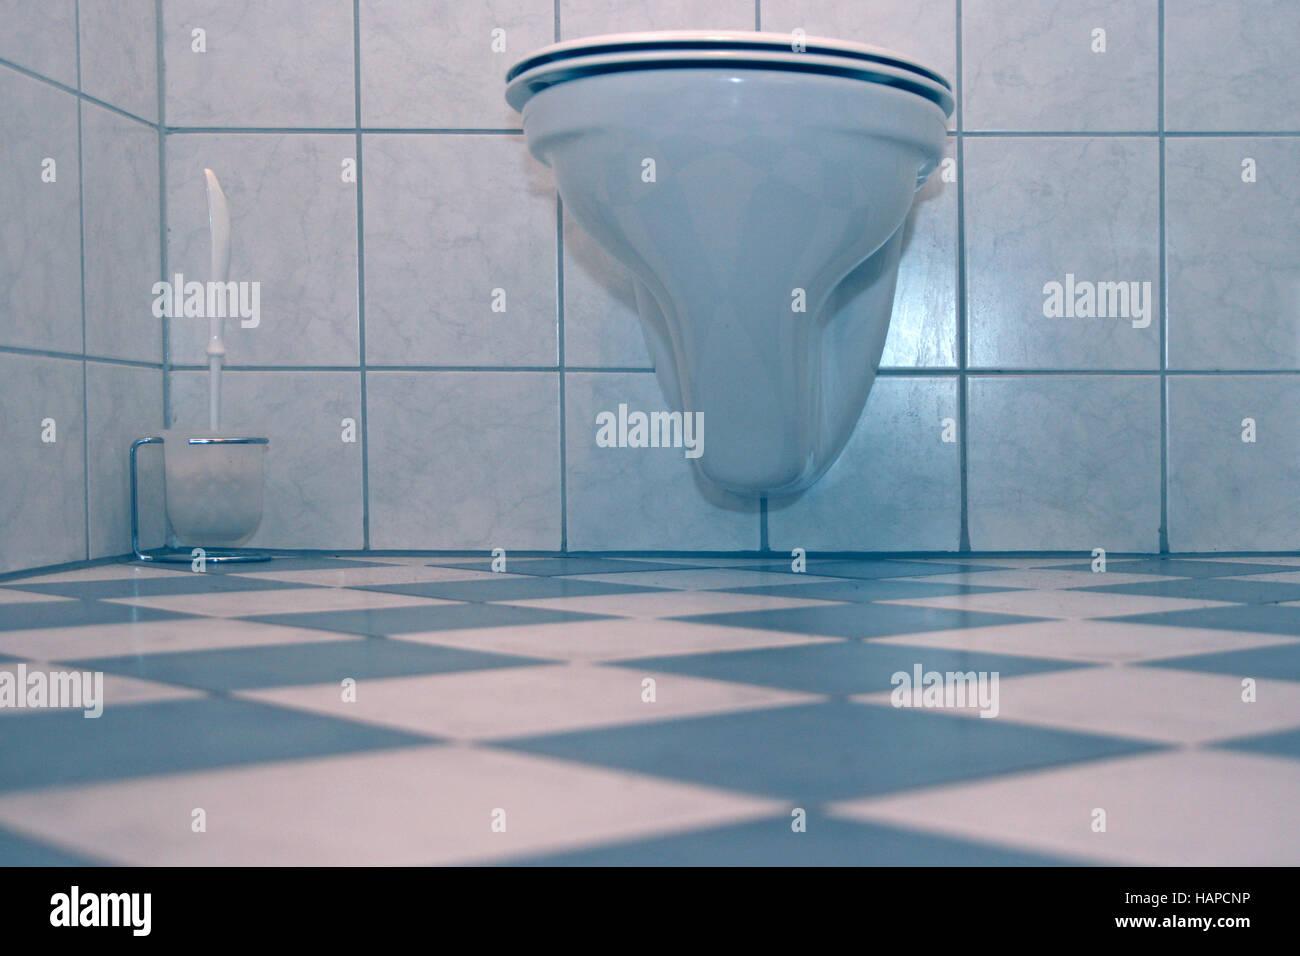 toilette - Stock Image